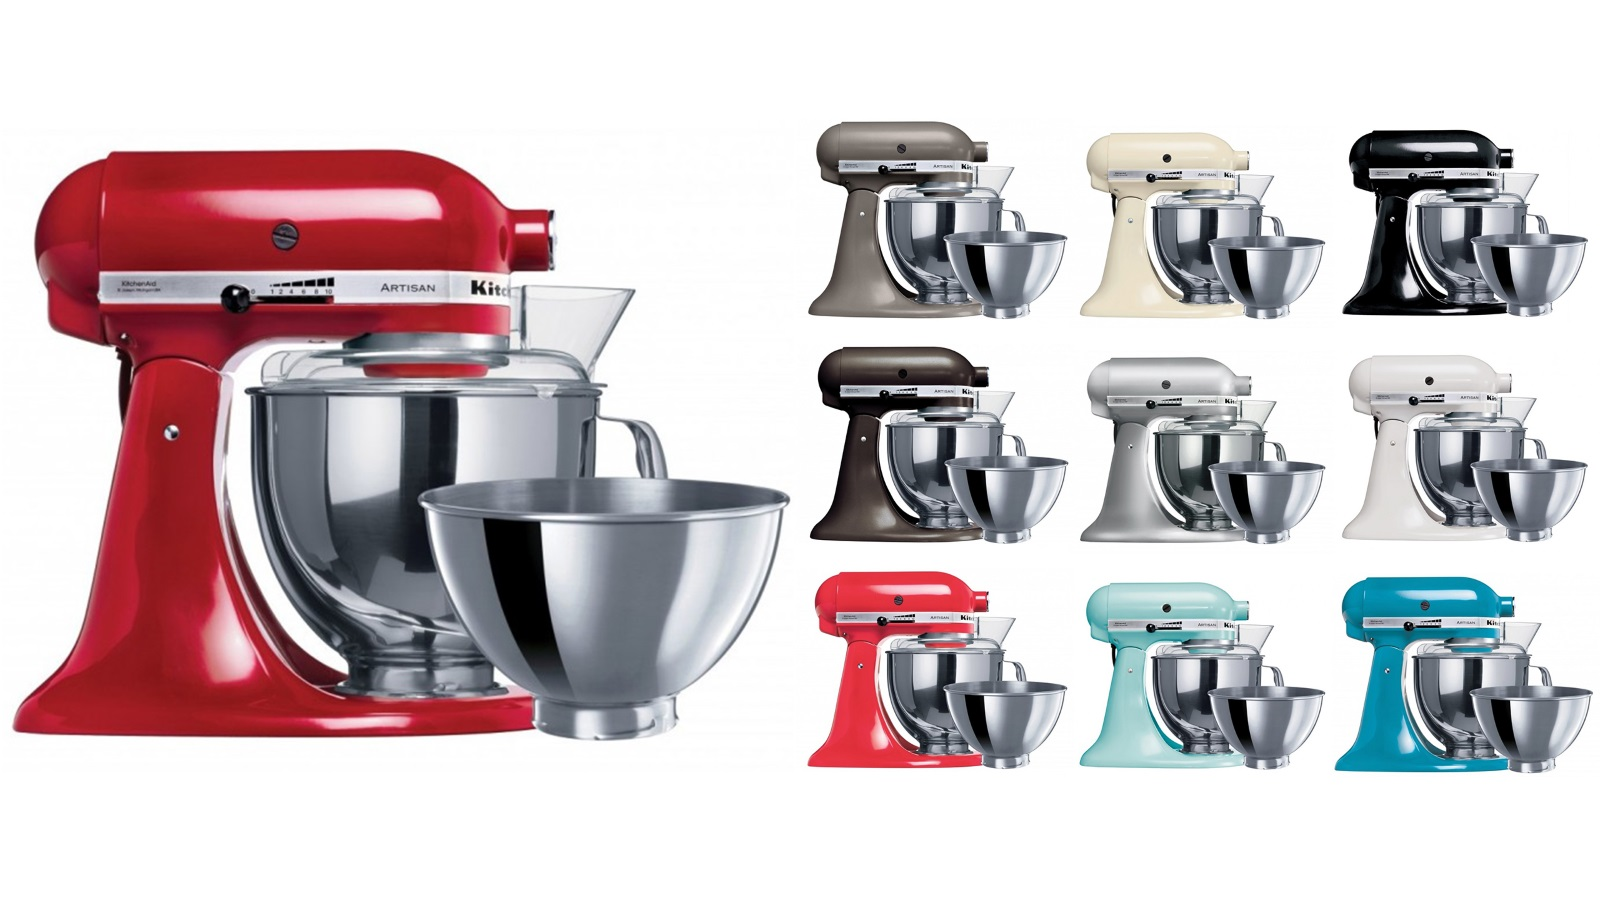 buy kitchenaid ksm160 artisan stand mixer harvey norman au rh harveynorman com au